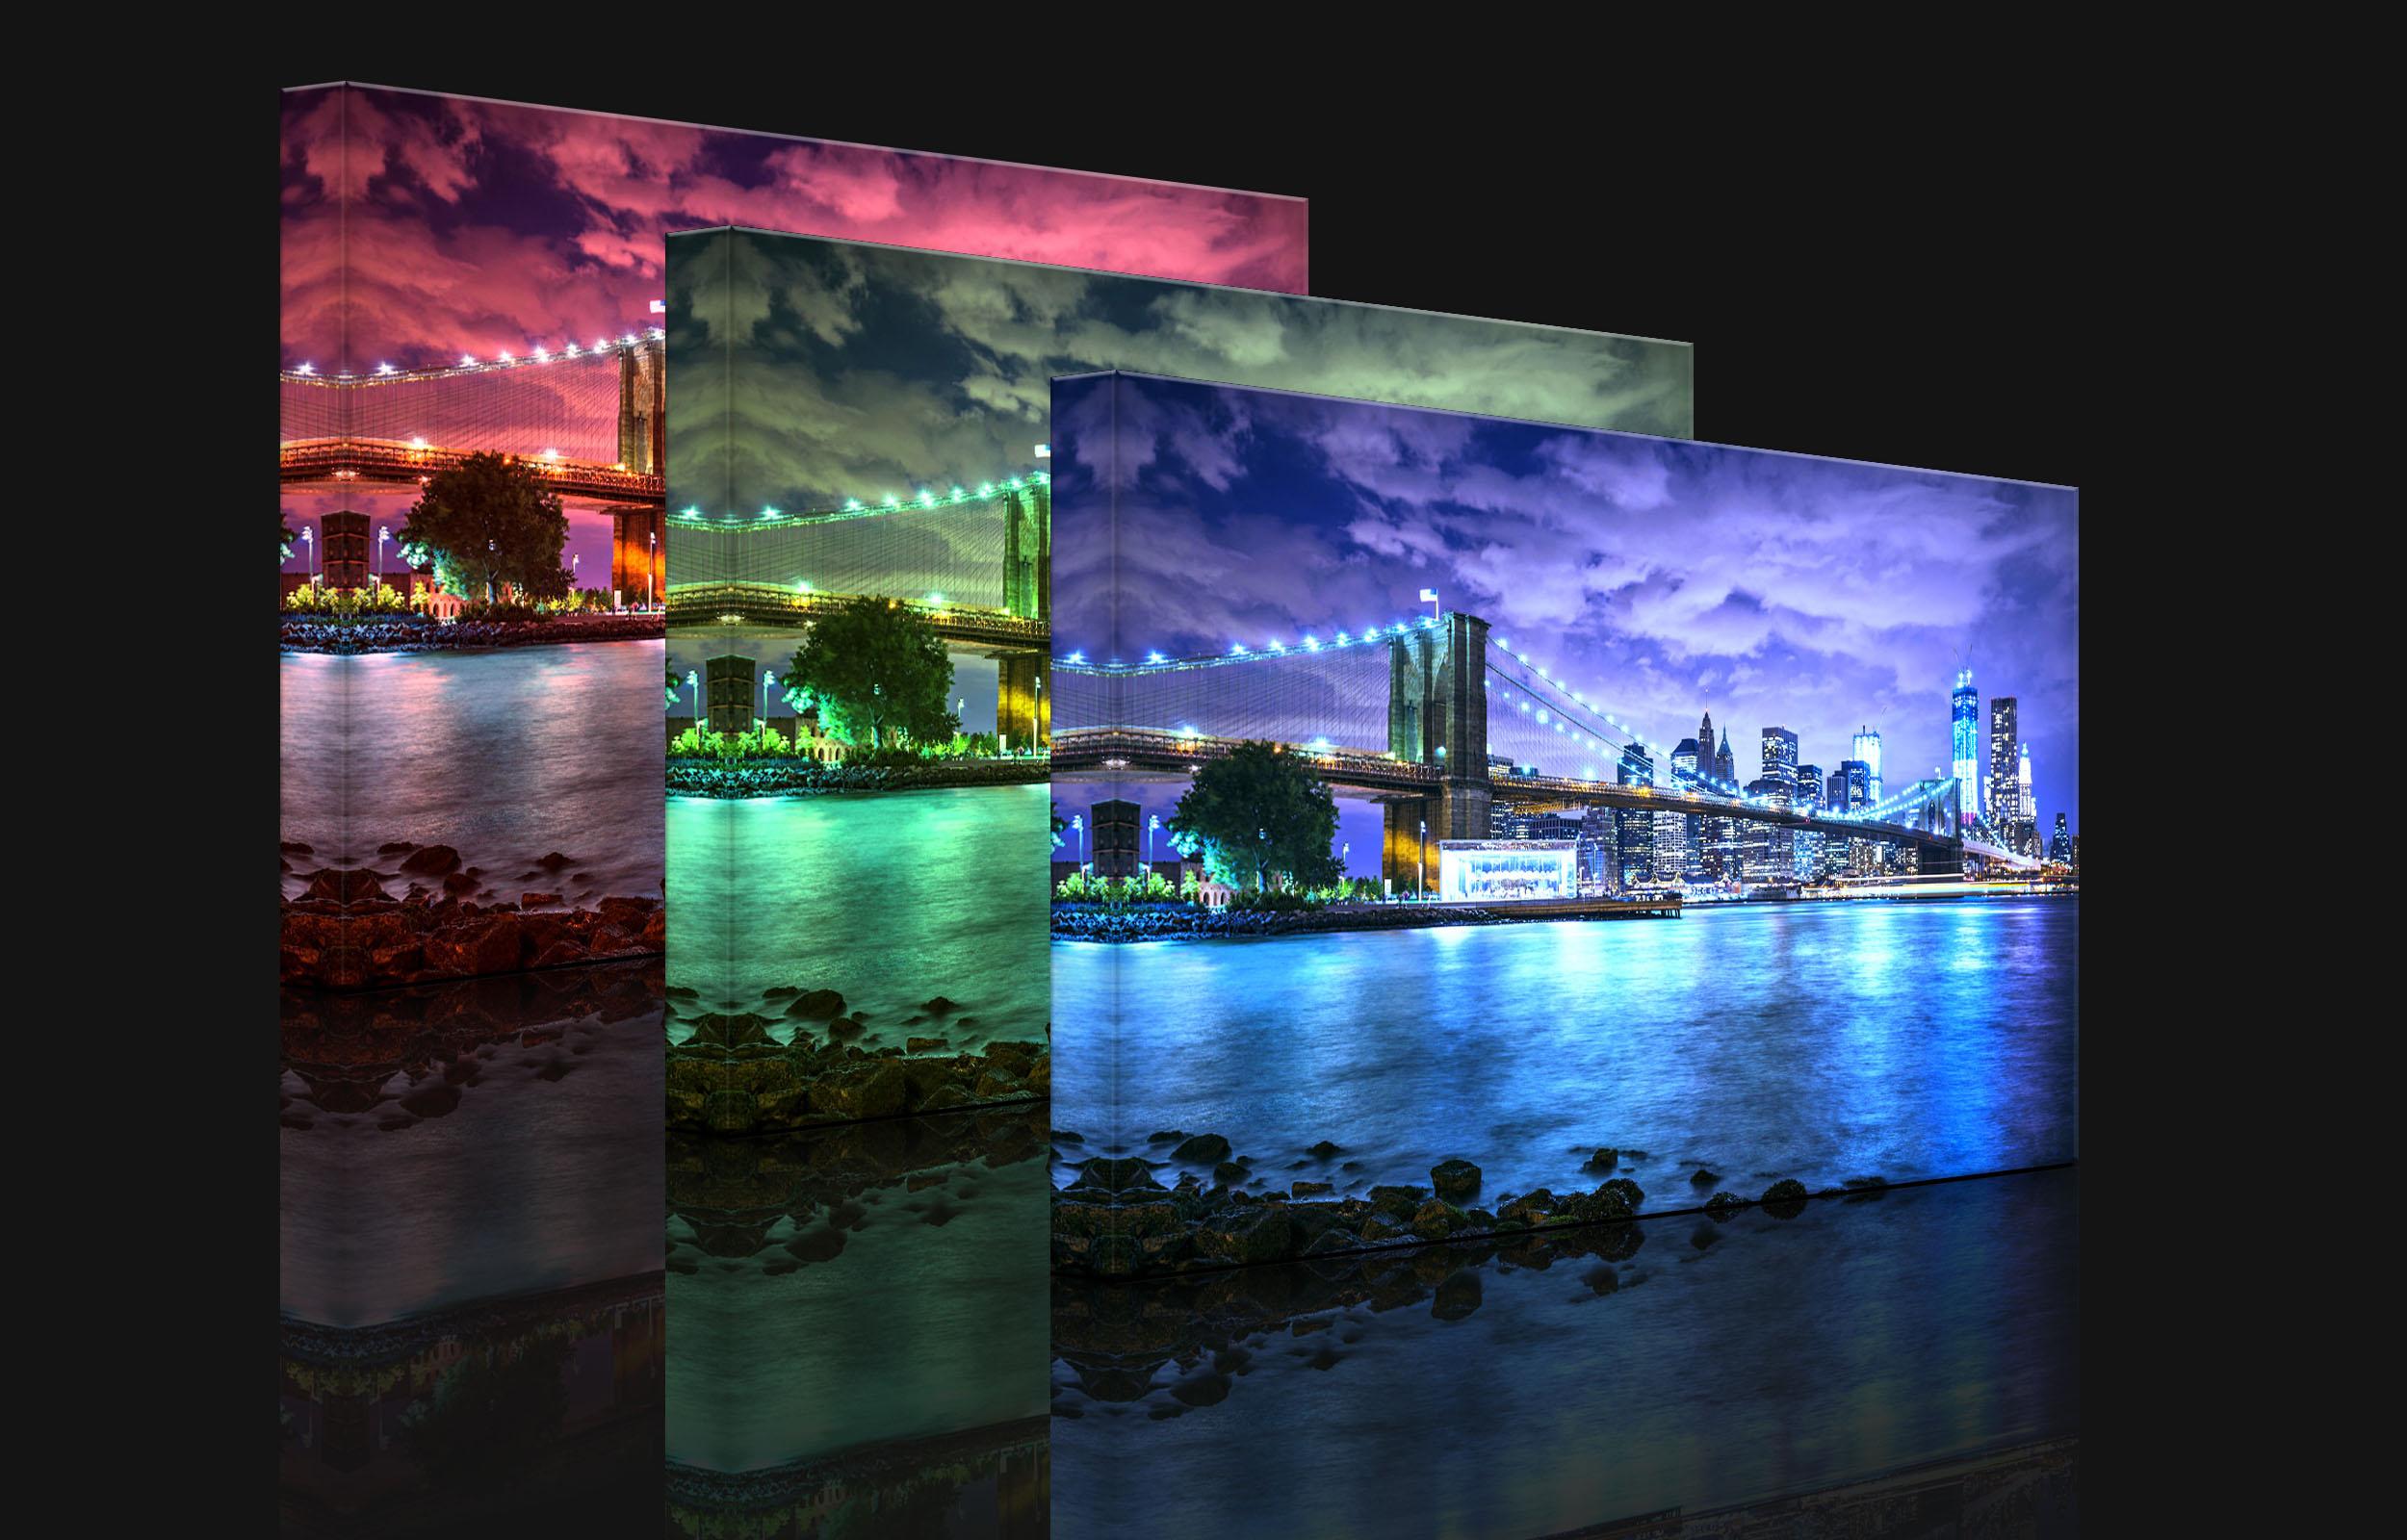 tableau illumin image led skyline de new york fully lighted ebay. Black Bedroom Furniture Sets. Home Design Ideas